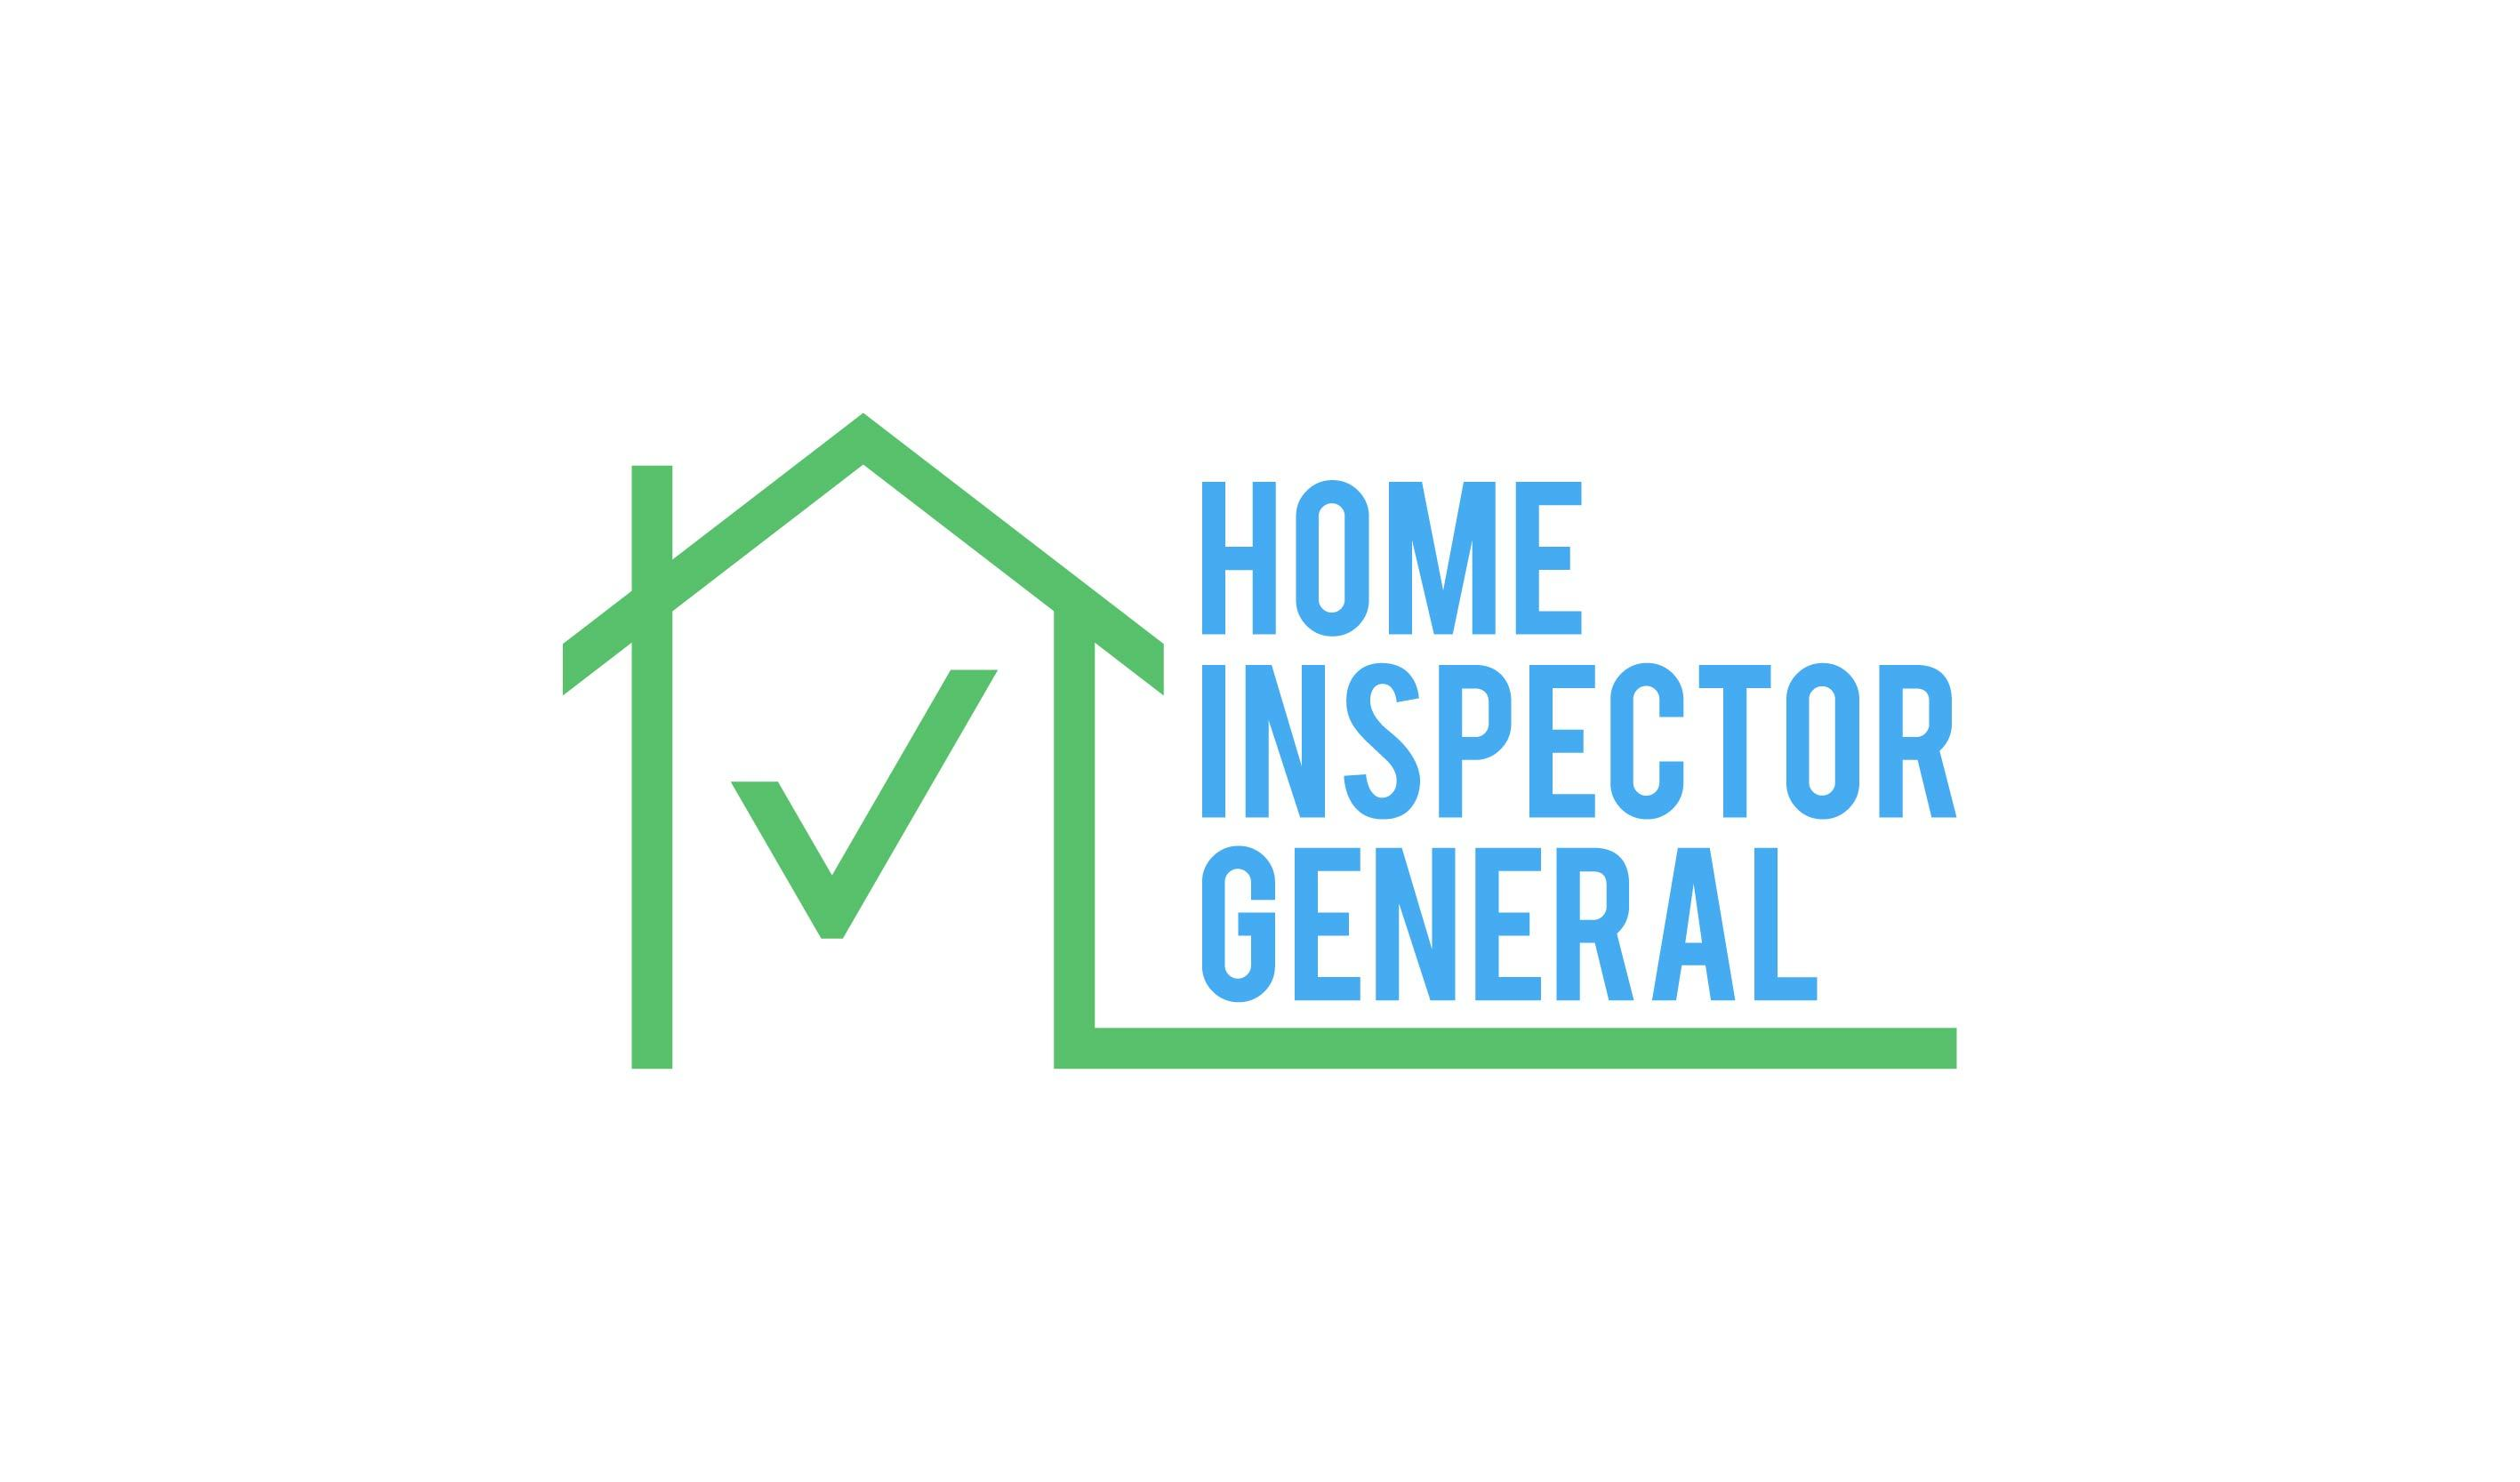 B home inspector general 01